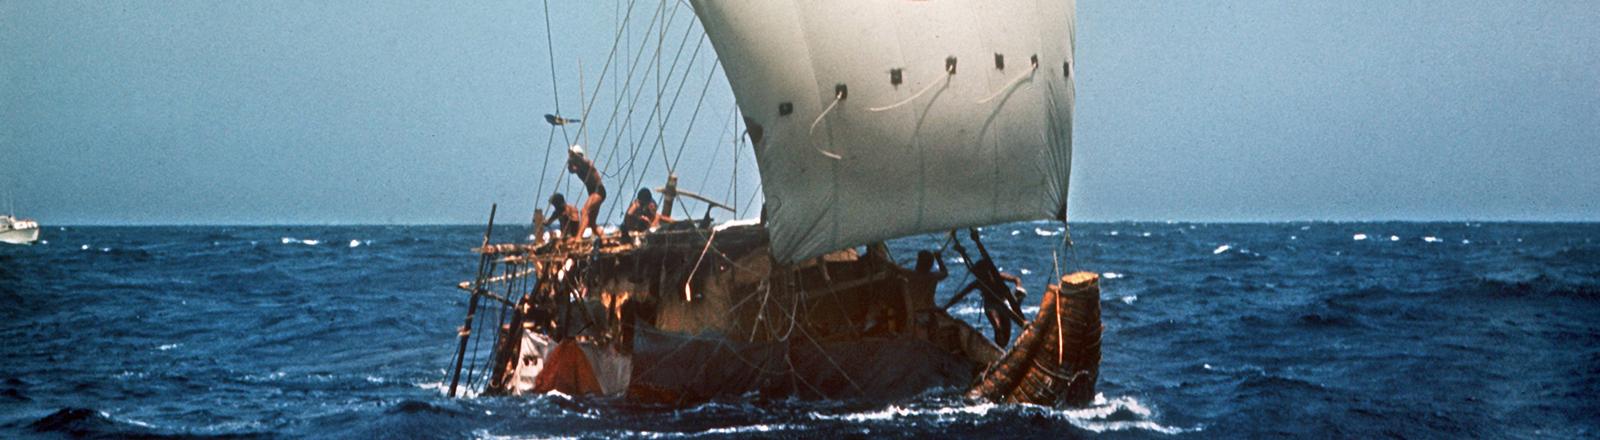 Mit dem Papyrusboot Ra II stach Thor Heyerdahl 1970 in See.